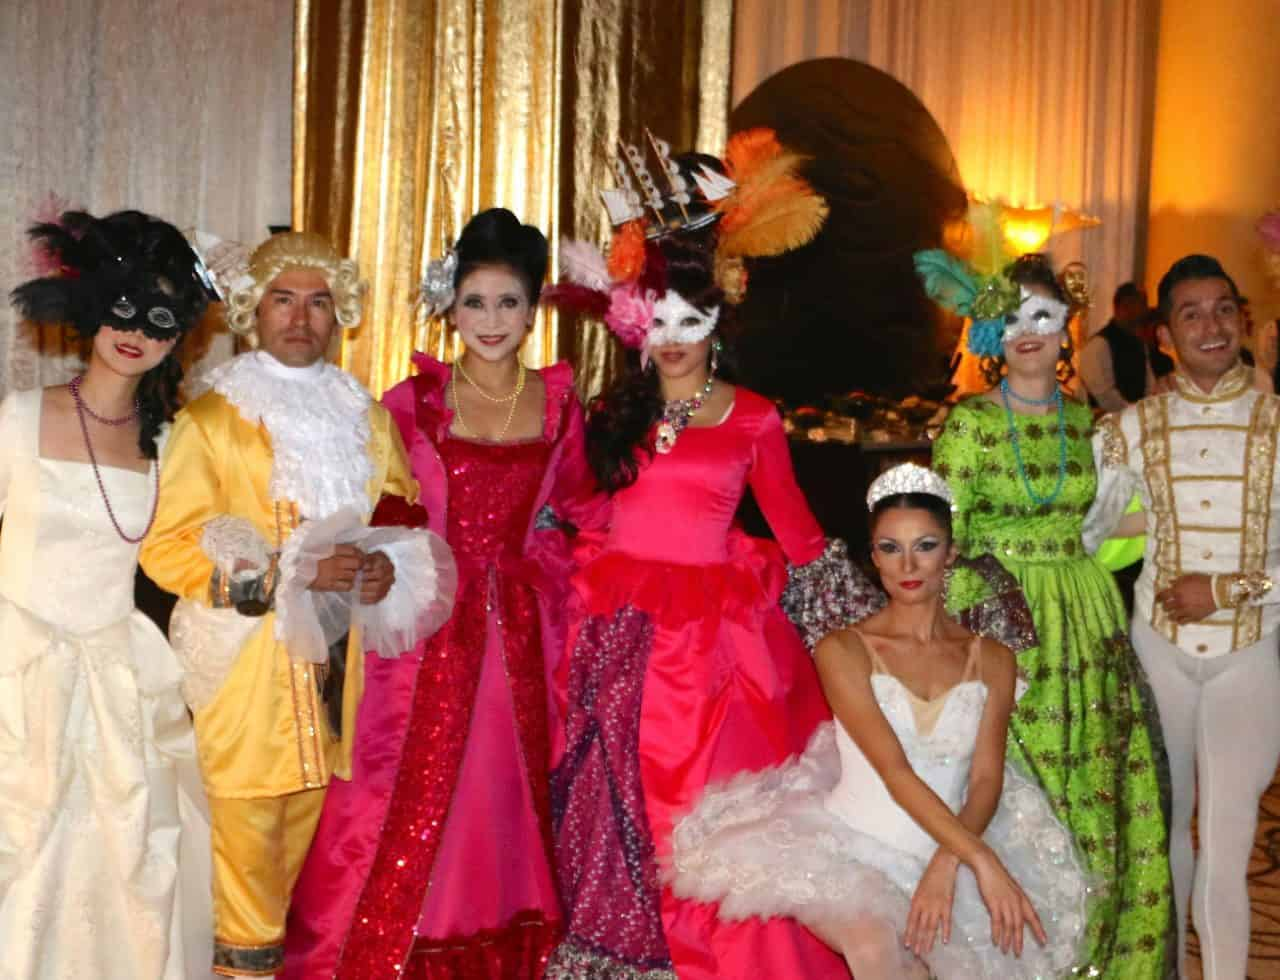 Masquerade theme entertainment